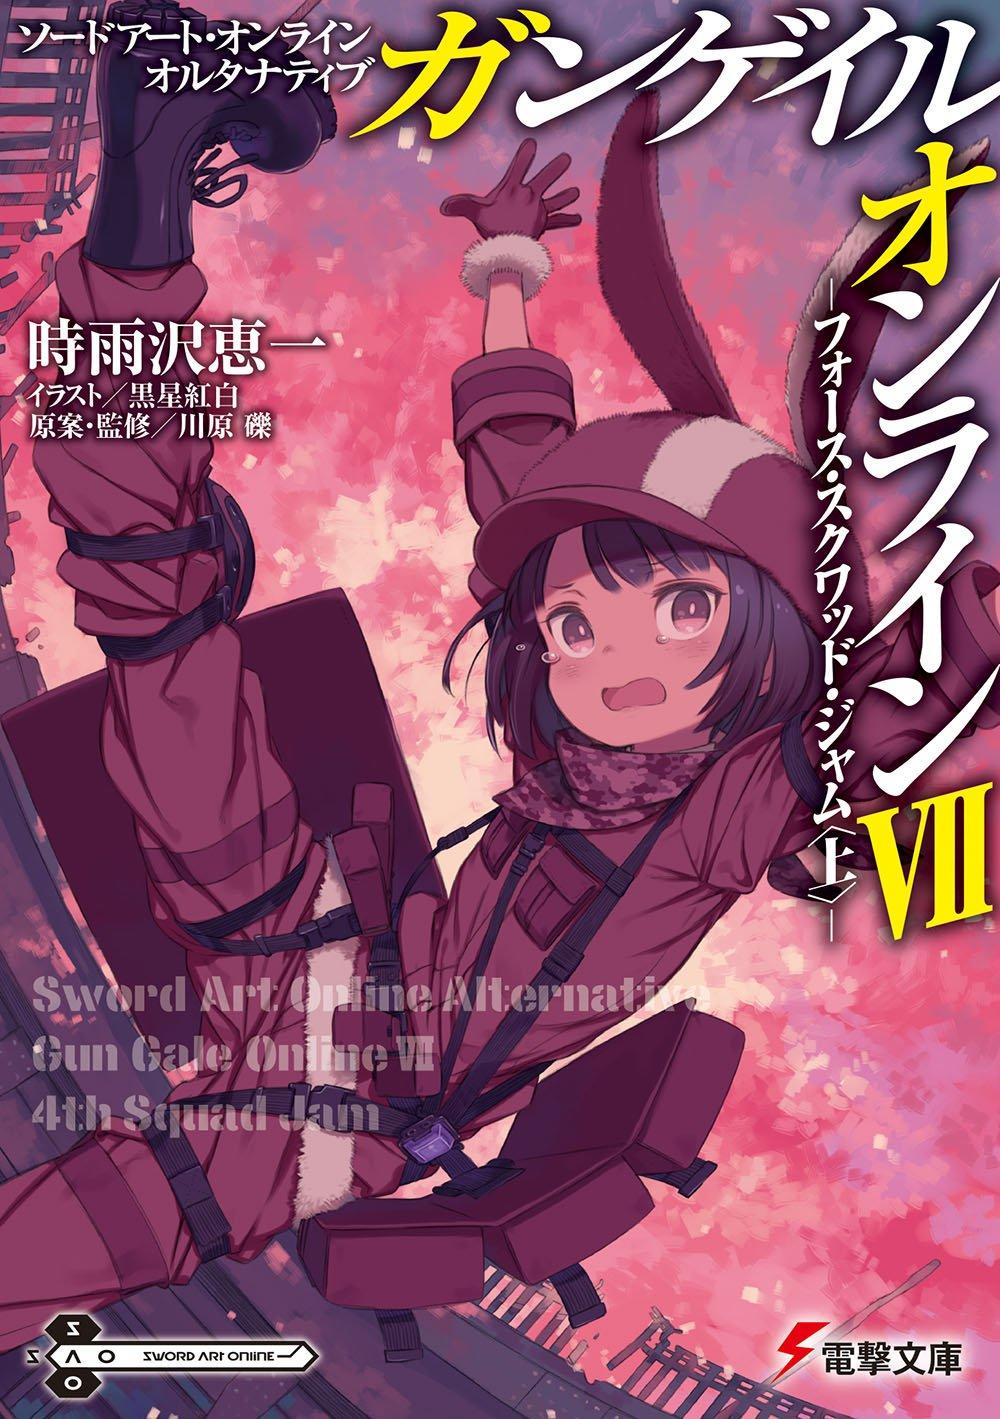 Sword-art-online-alternative-capa-volume7